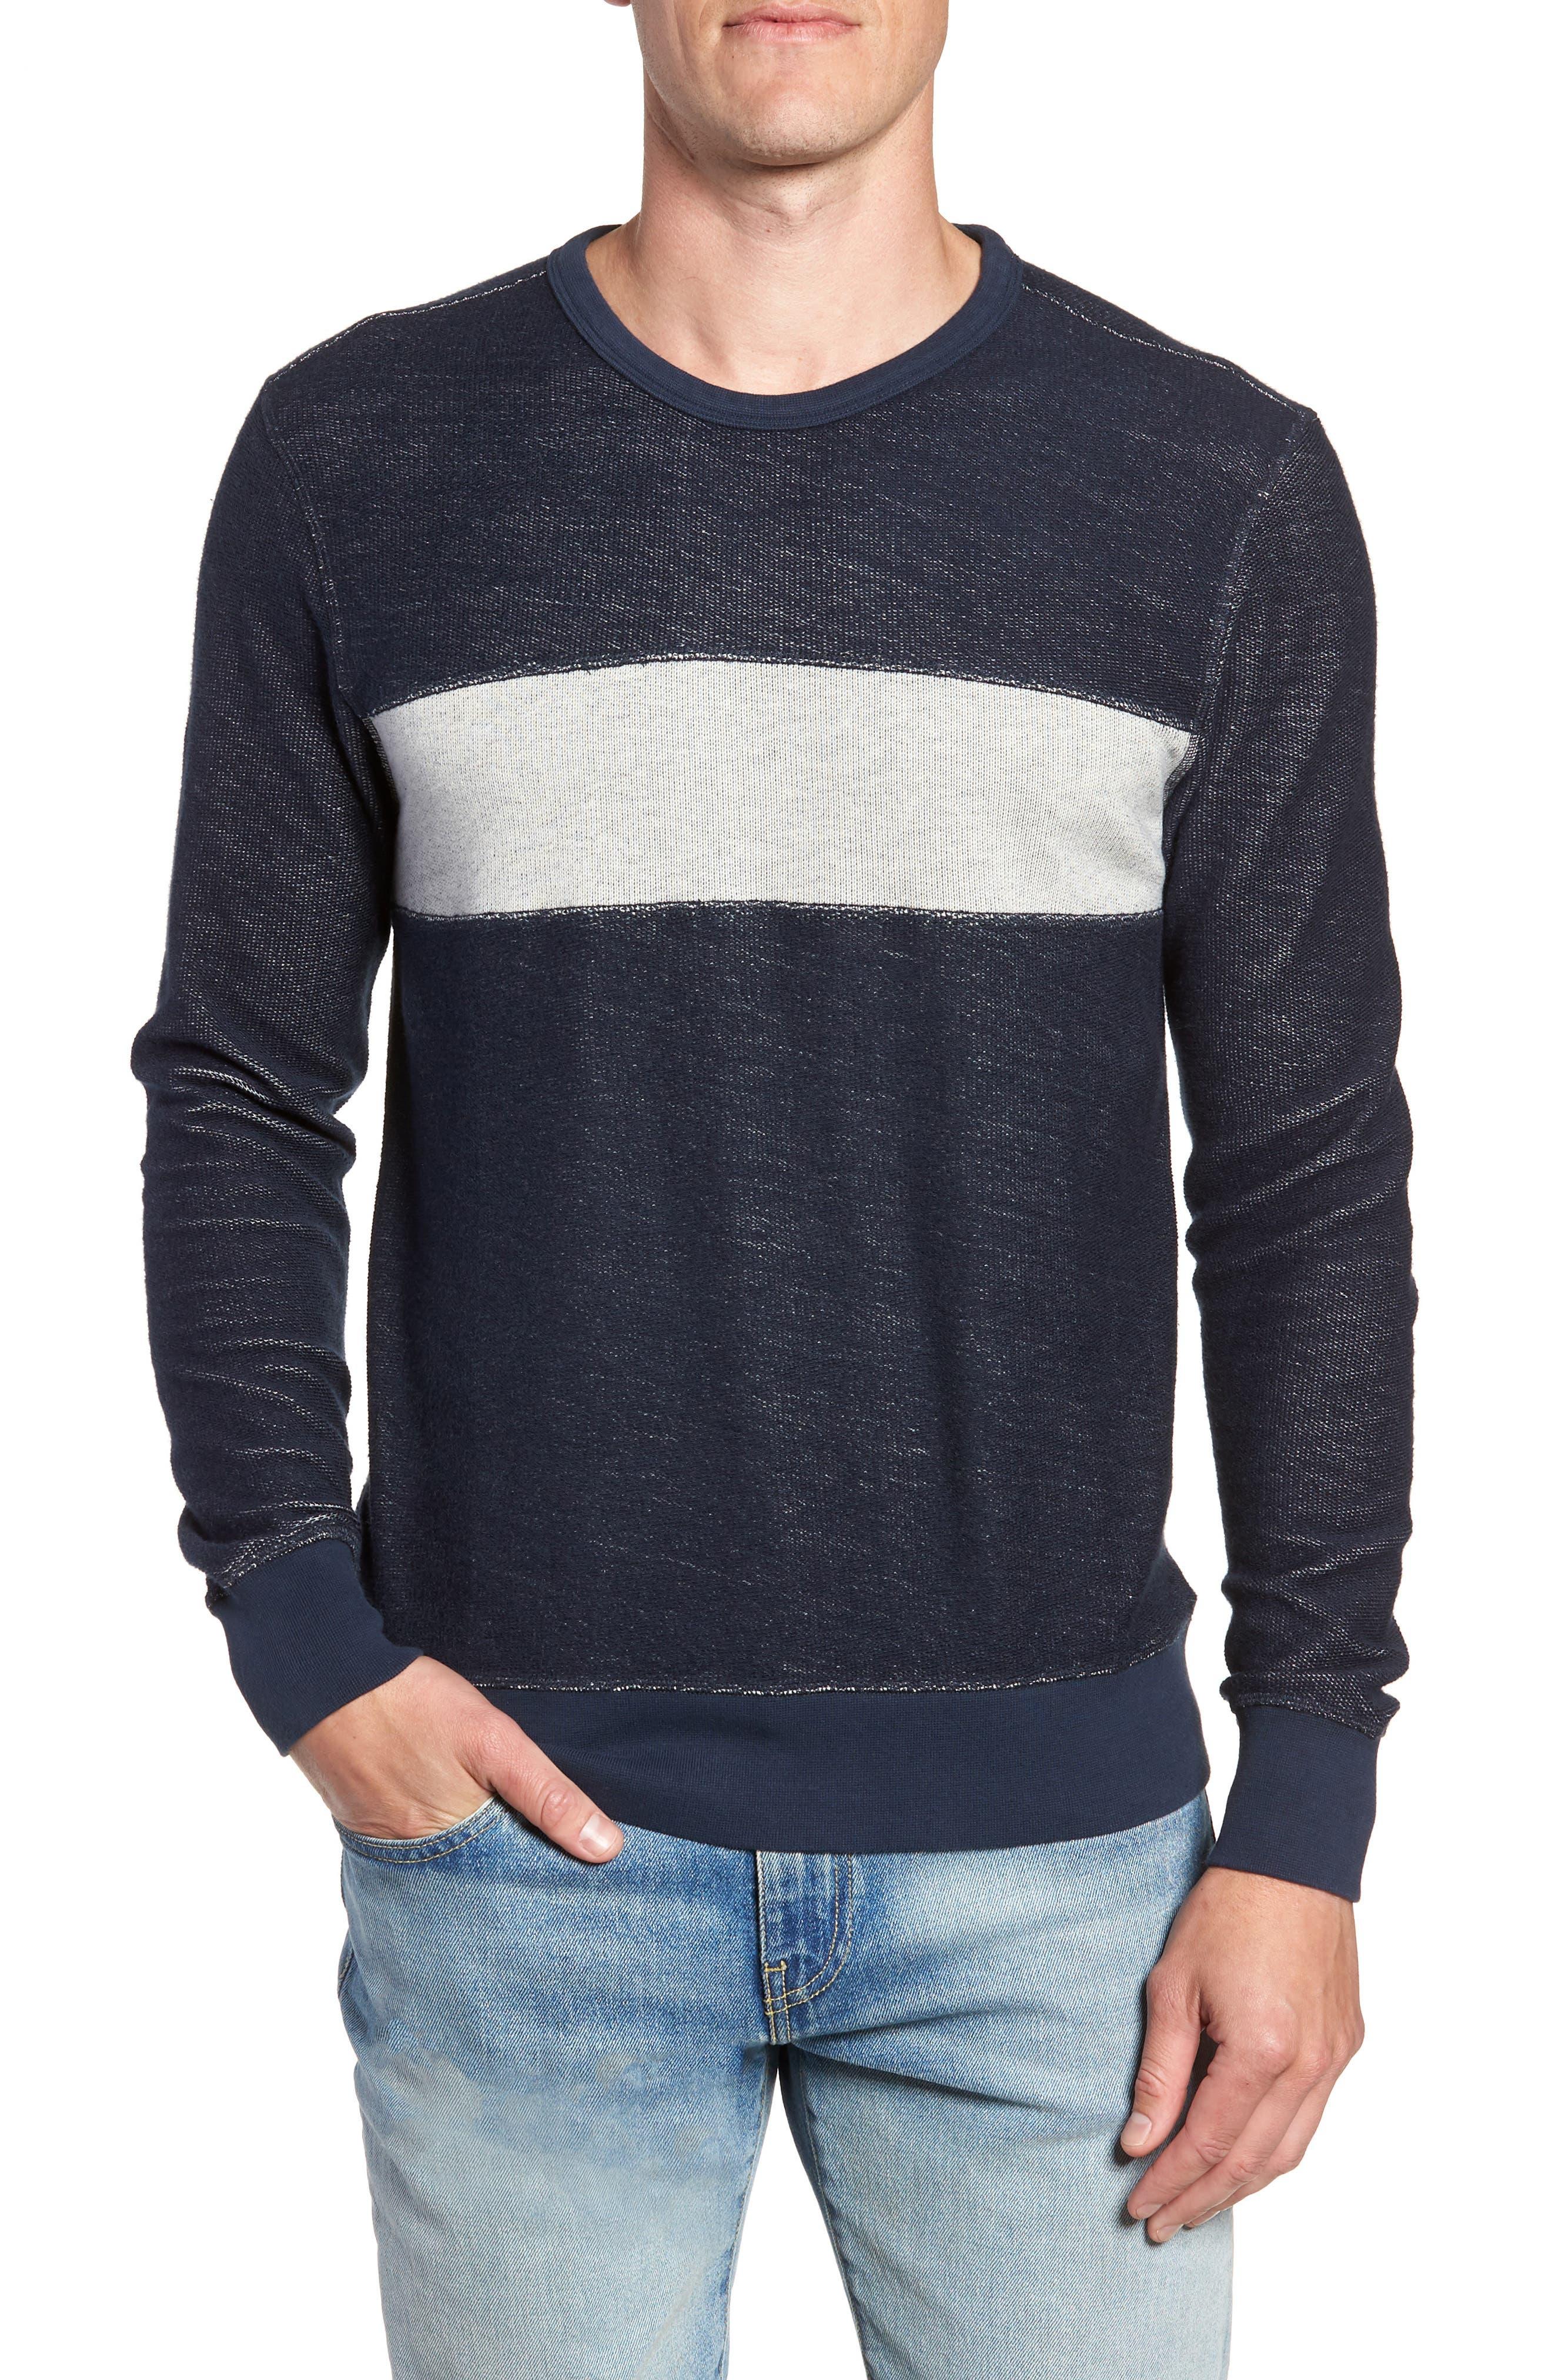 Reversible Colorblock Terry Sweatshirt,                             Main thumbnail 1, color,                             Navy / Grey